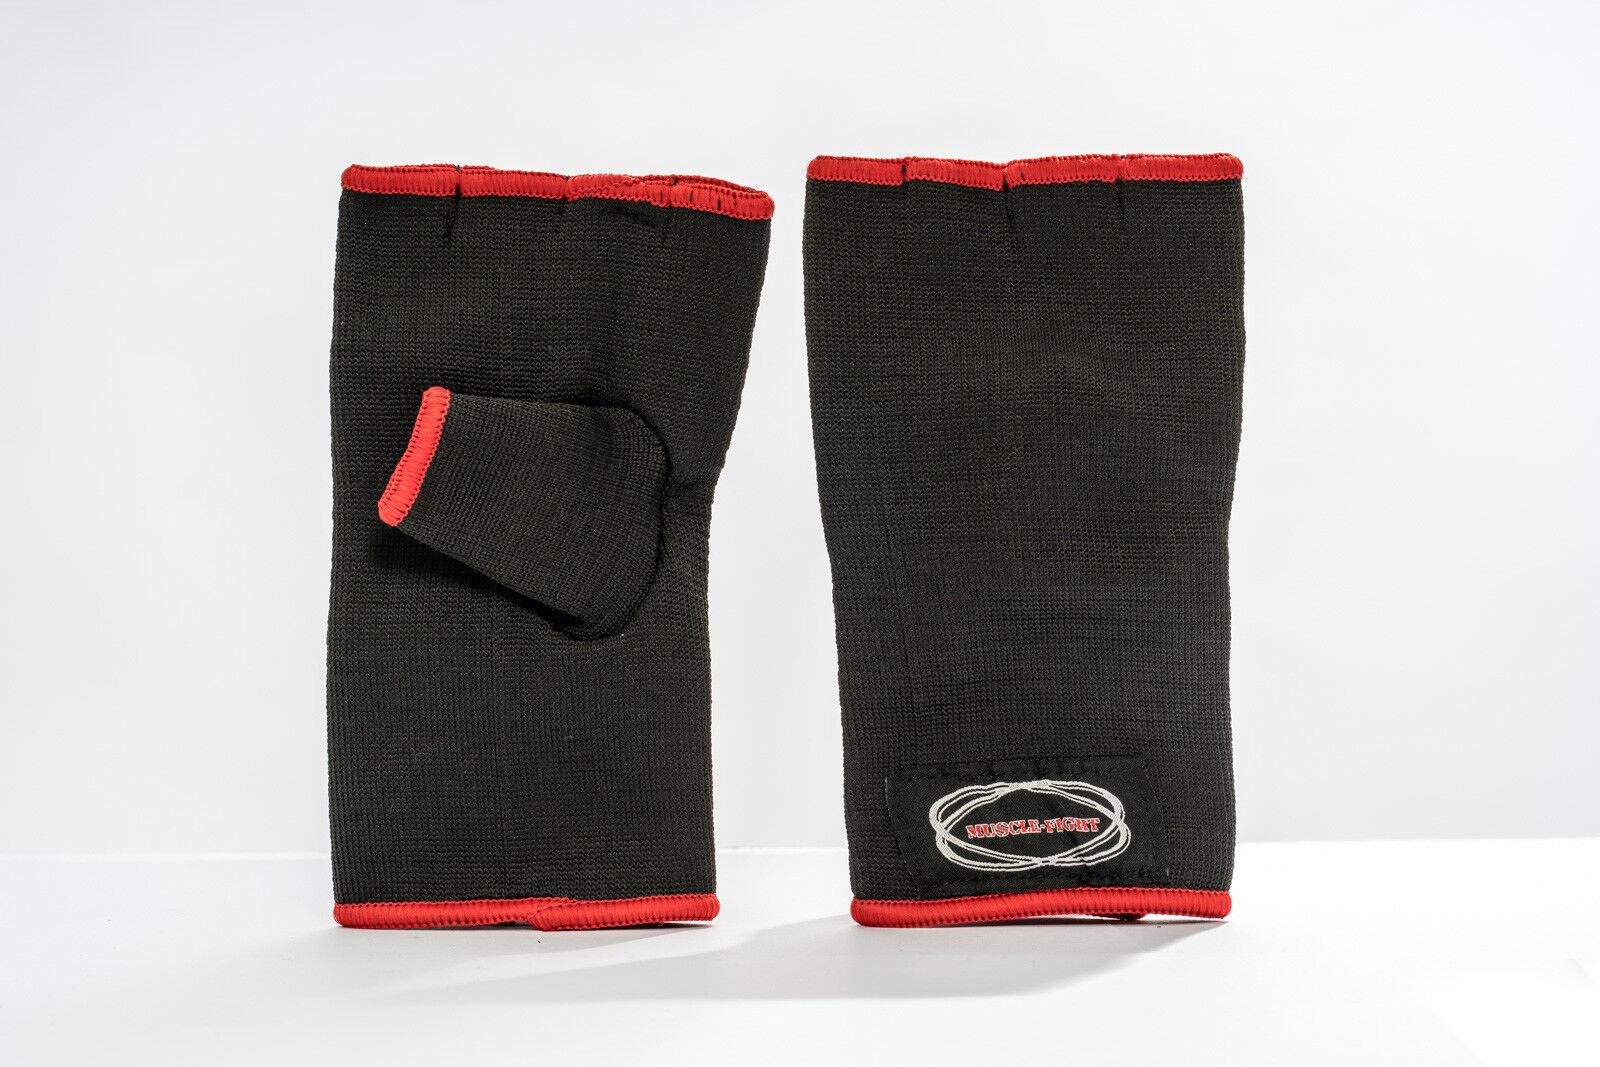 Innenhandschuhe Boxen Handschuhe Boxbandagen Schlupfbandagen Kickboxen Sport